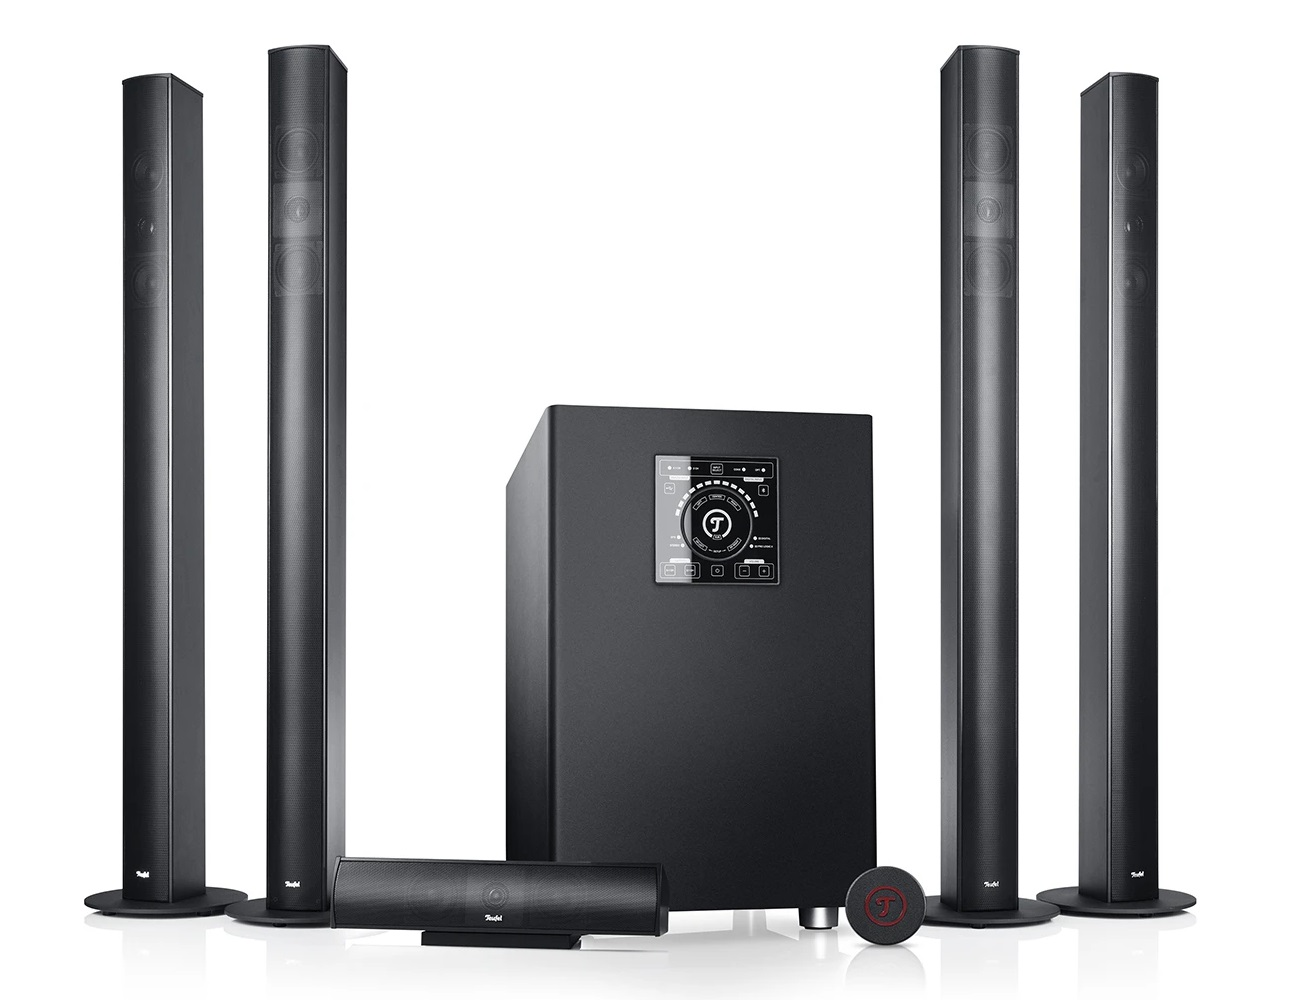 Concept E 450 Digital Superior Edition